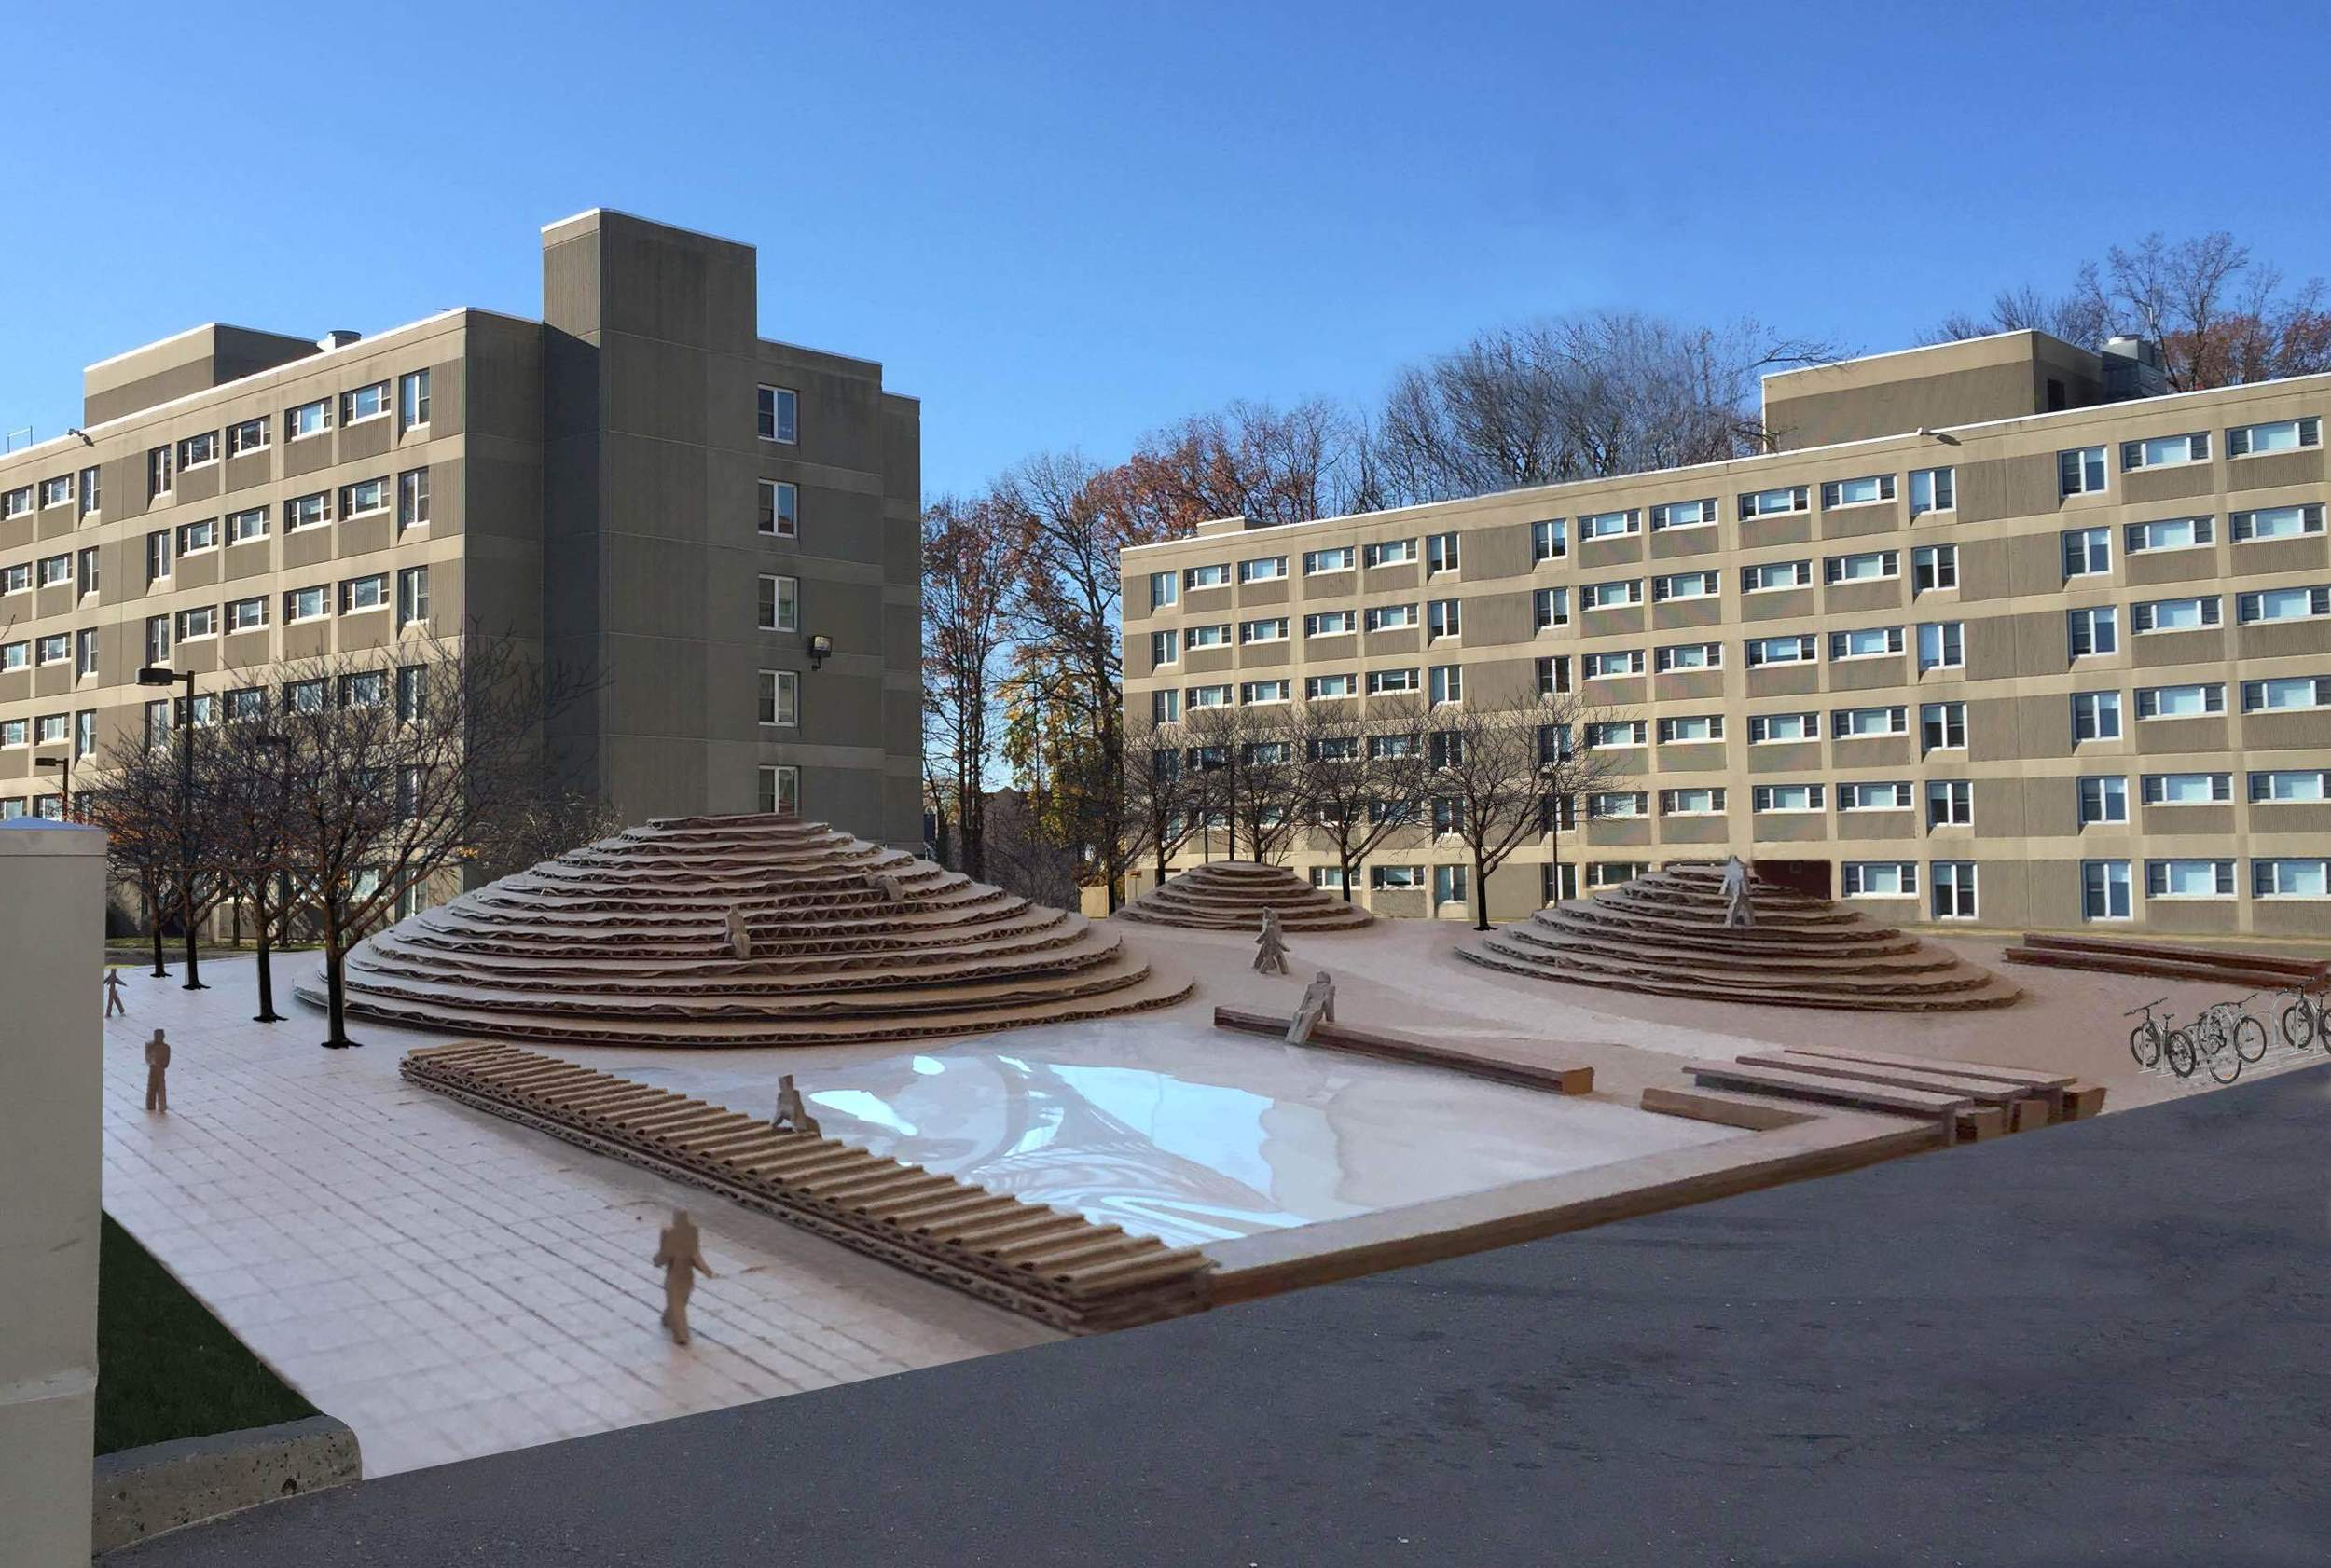 KLabs_Undergraduate Student Quad_Renovation_Cardboard model_perspective_2015.JPG